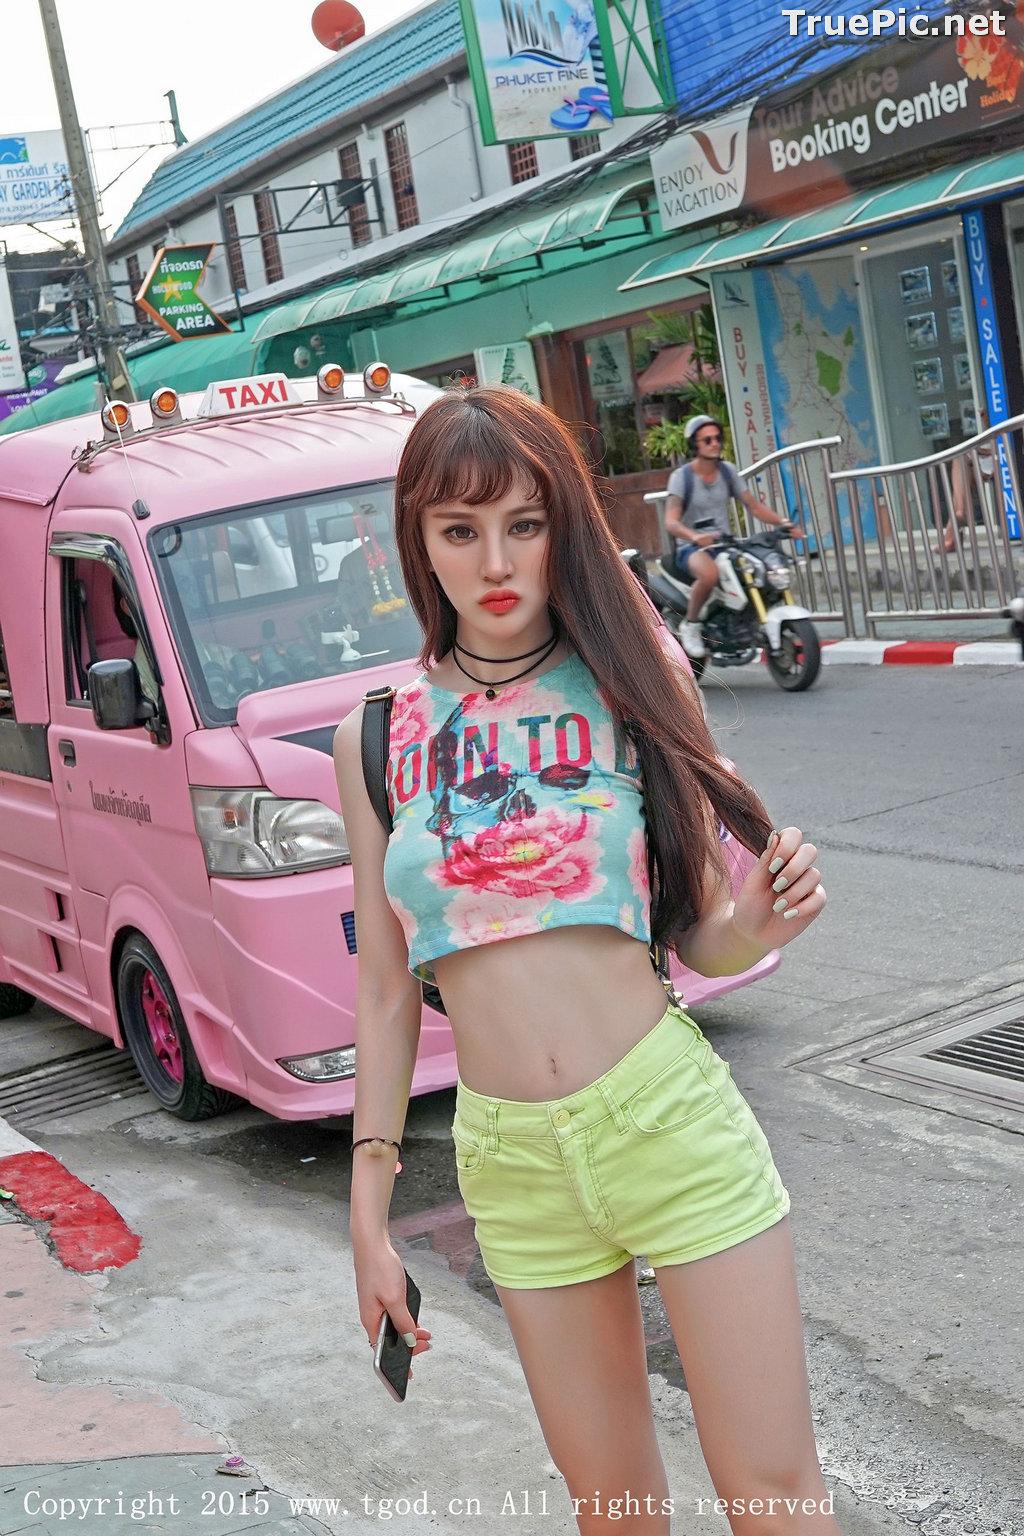 Image TGOD 2015-12-03 - Chinese Model - Cheryl (青树) - TruePic.net - Picture-5